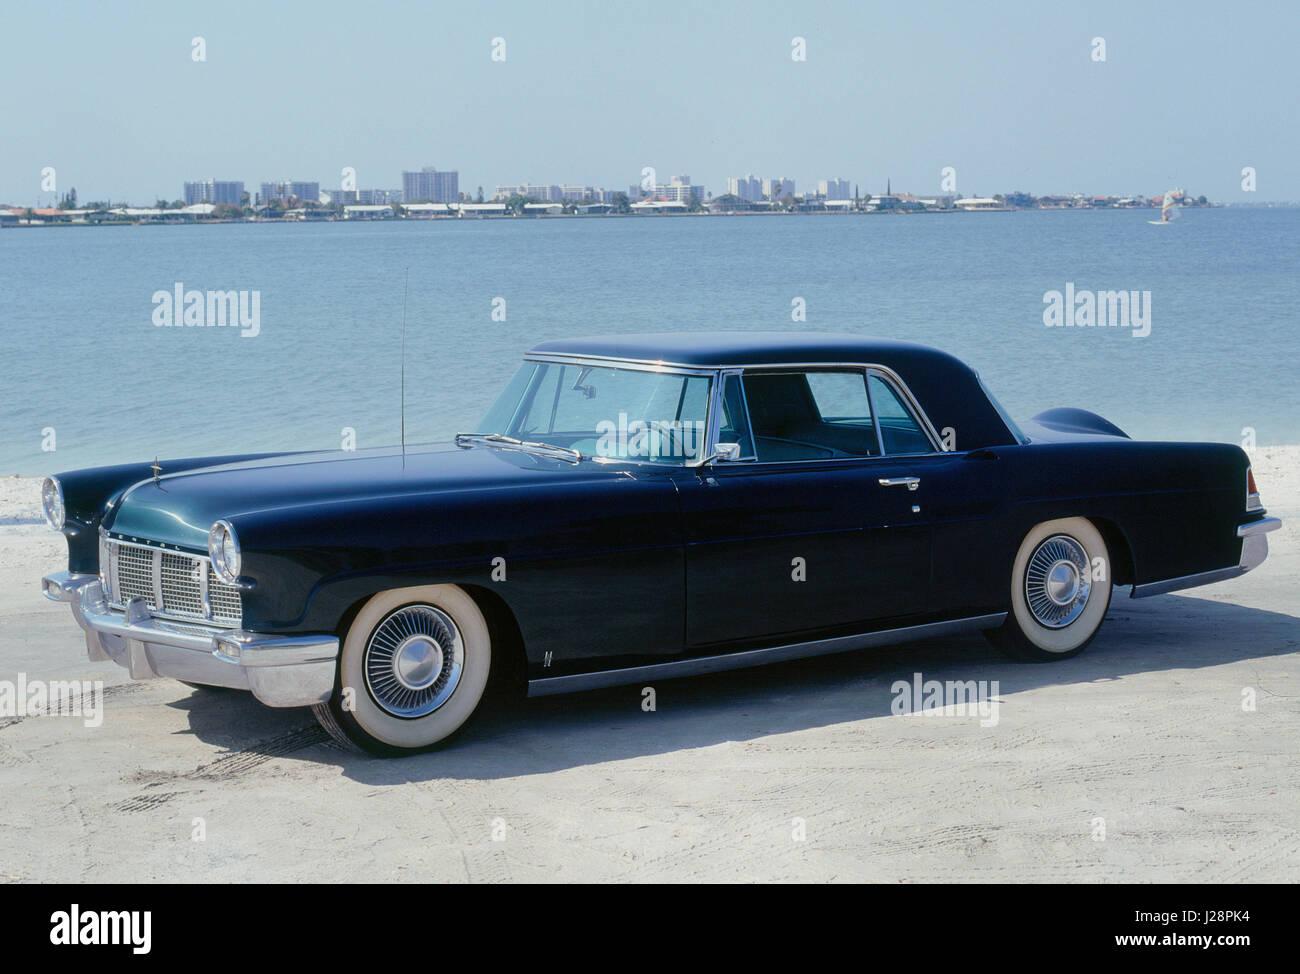 1956 Lincoln Continental MK2 - Stock Image